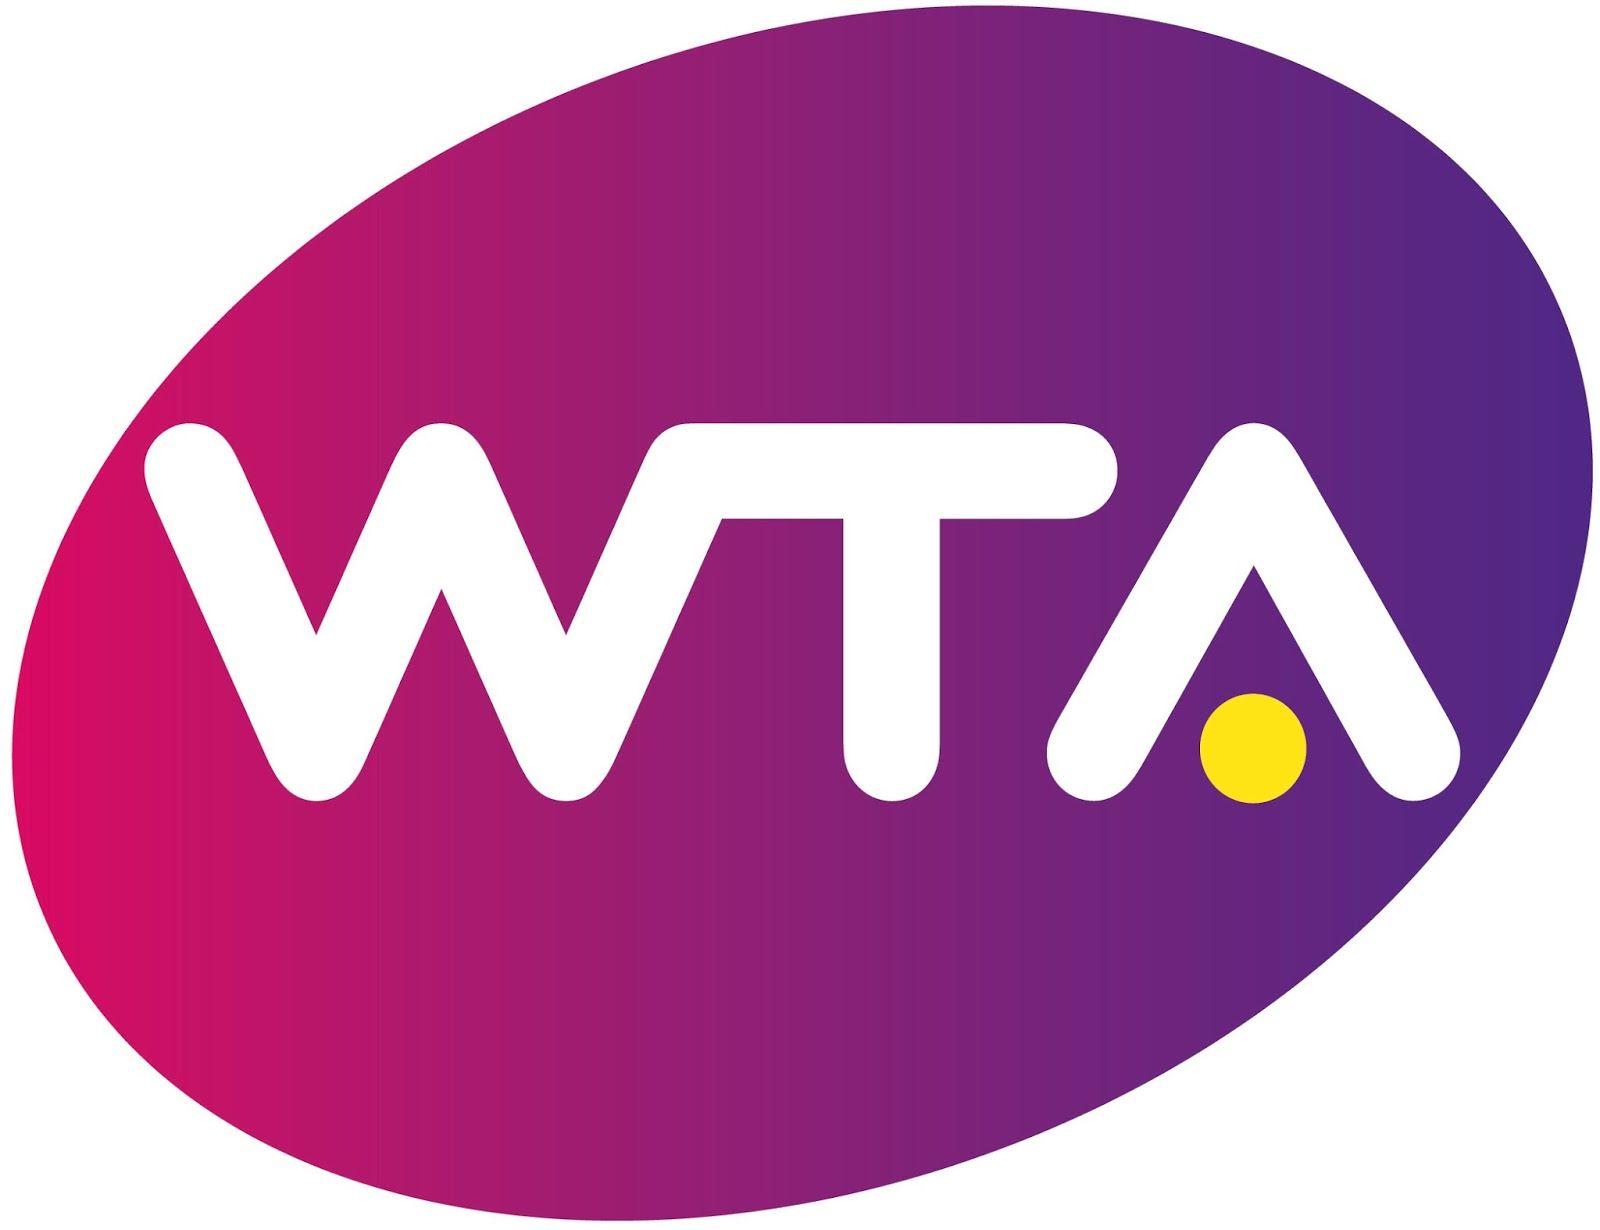 Women's Tennis Association The principal organizing body